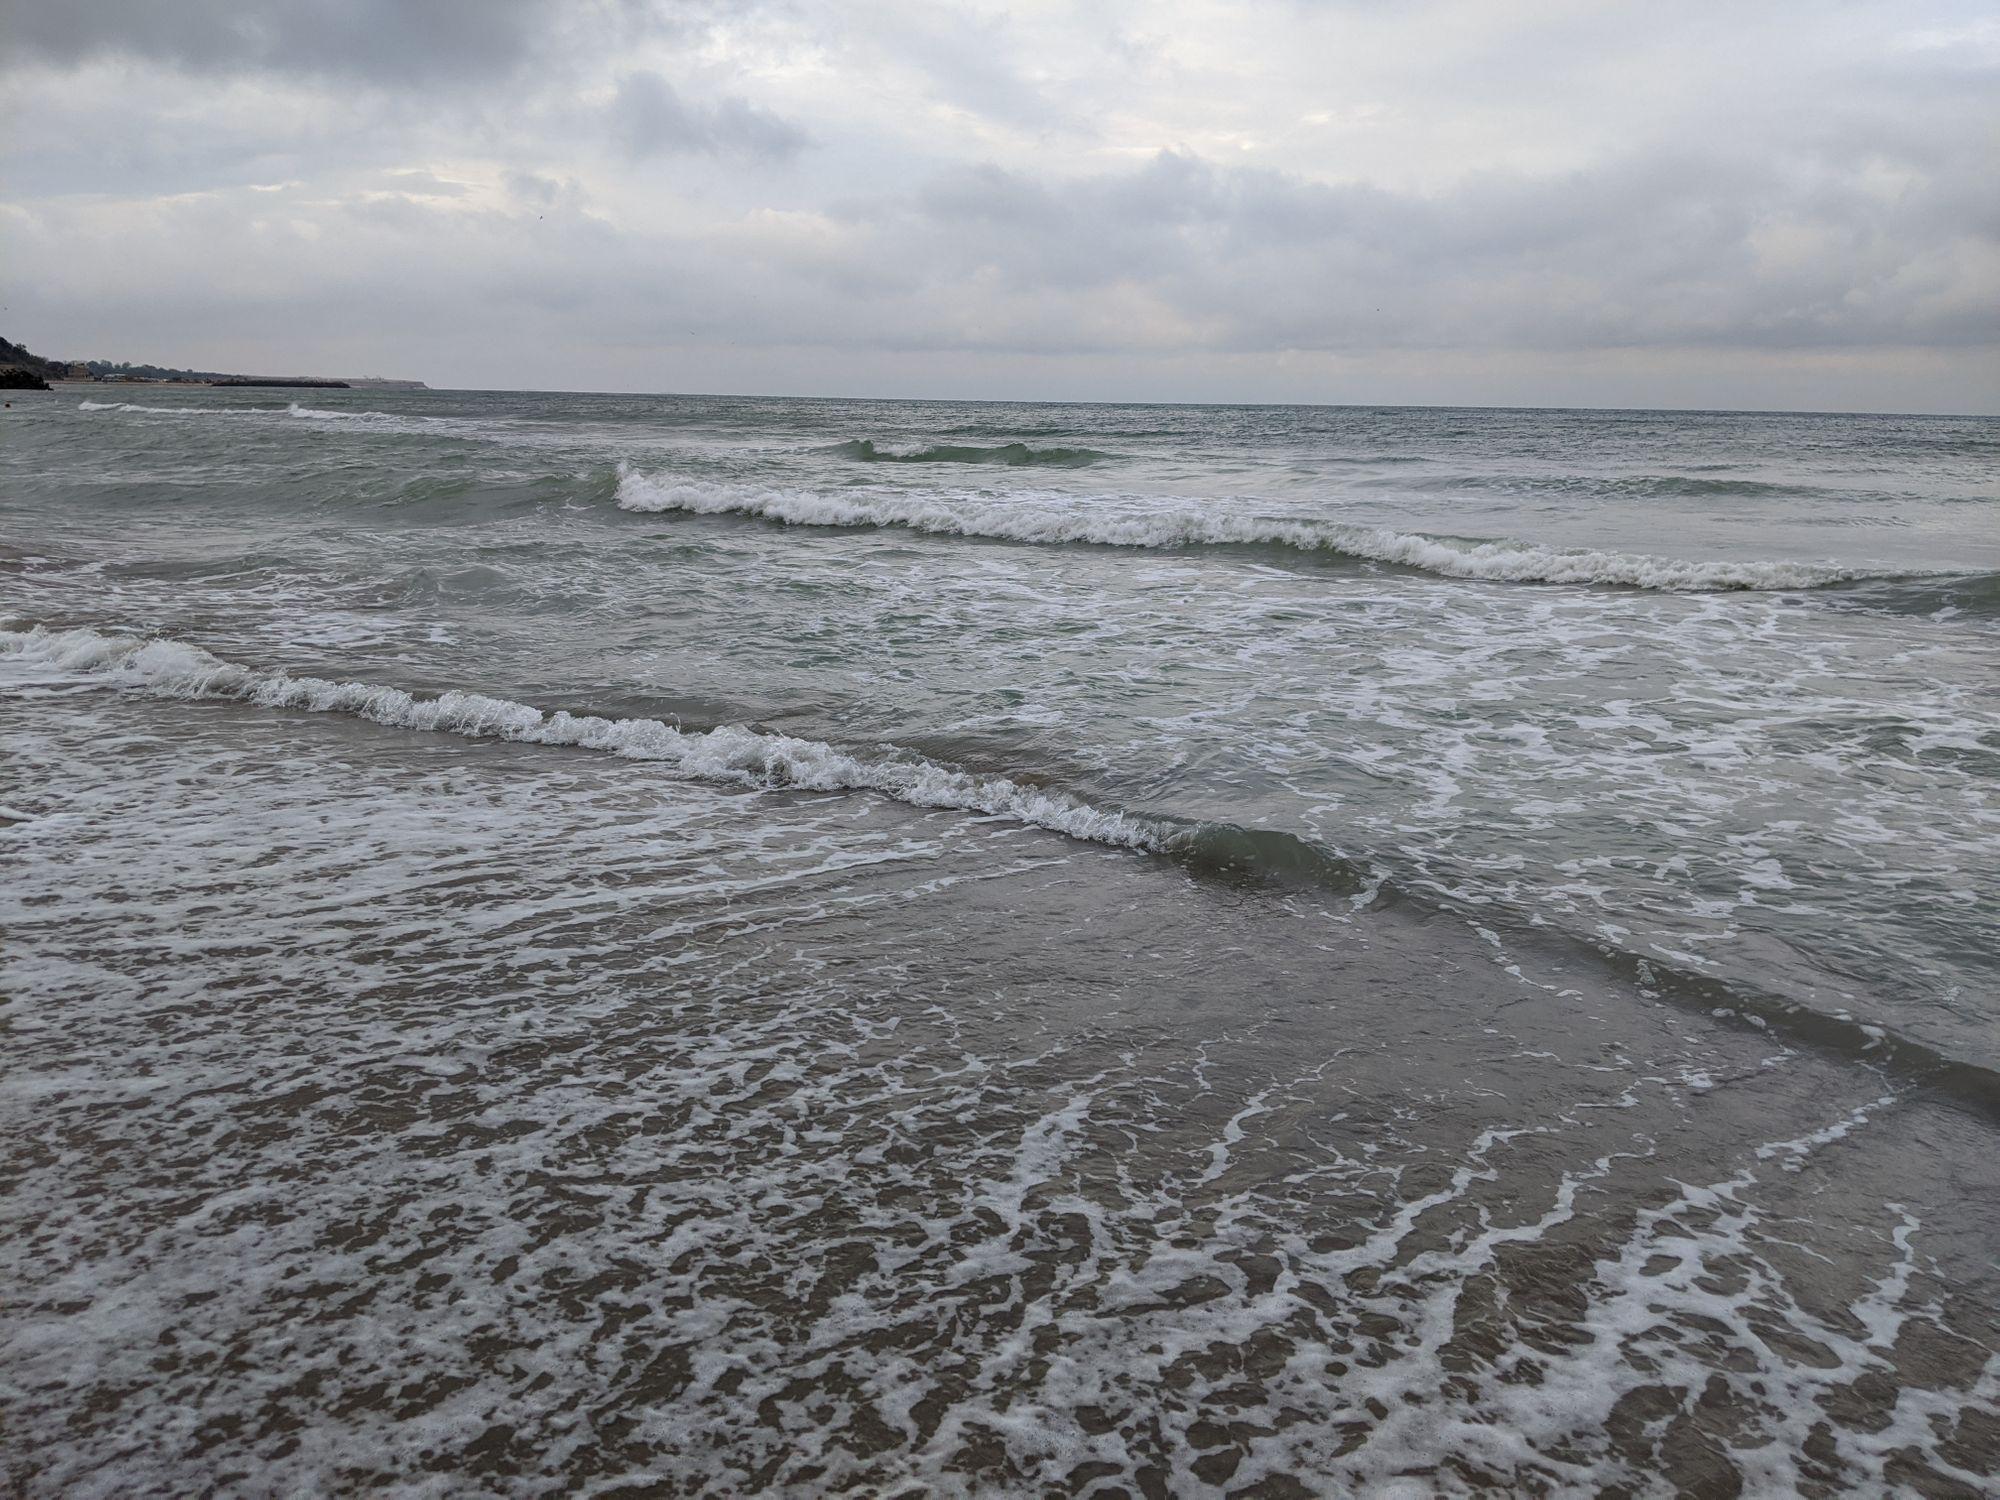 Visiting Romania: The Black Sea